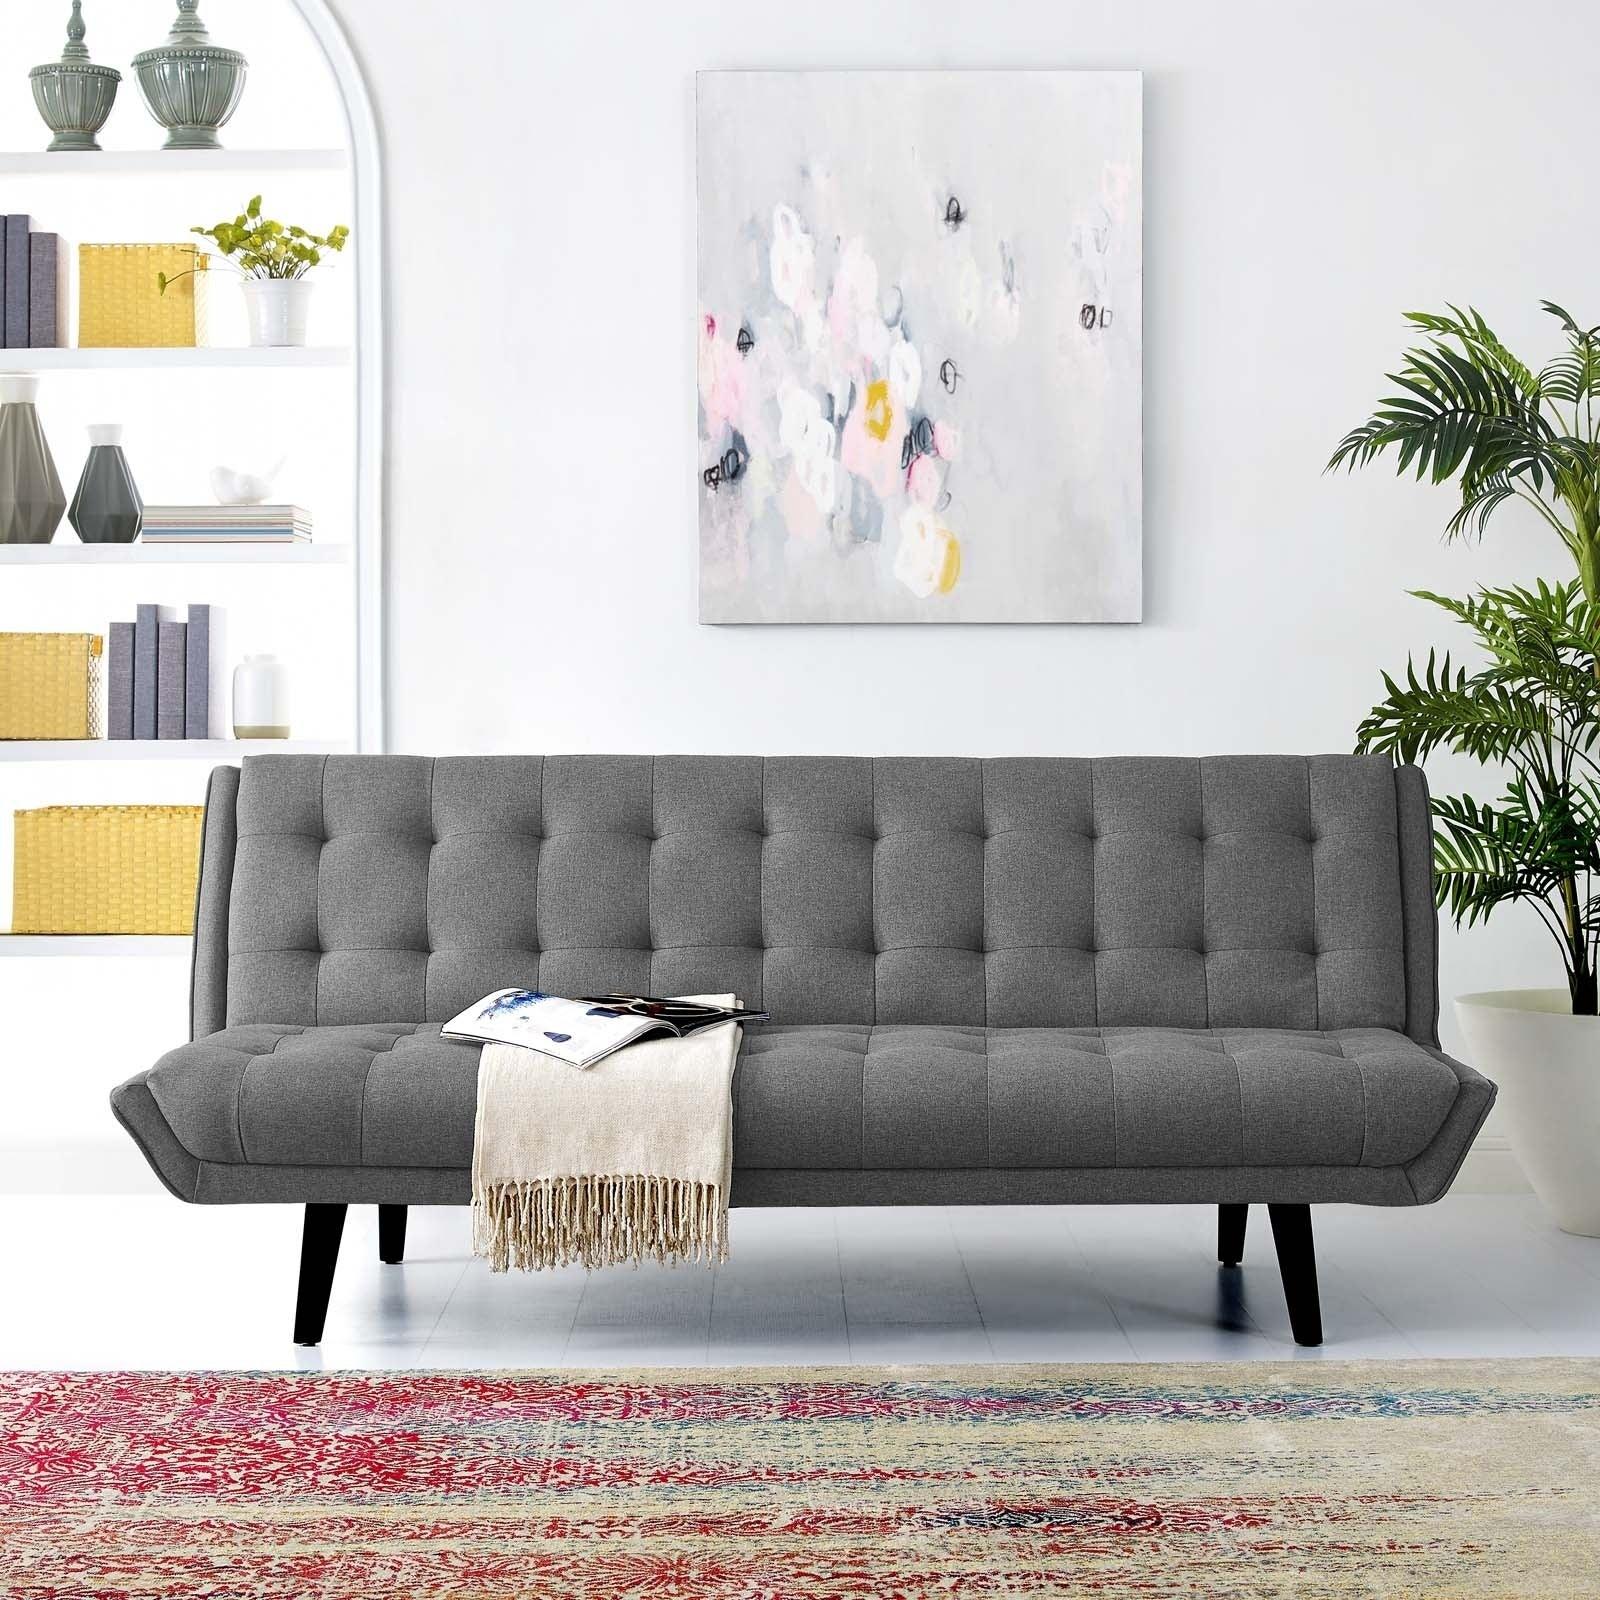 Glance-Tufted-Convertible-Fabric-Sofa-Bed-n-a-ca31fde2-5a61-4b07-9b50-d6daf4cffbd6